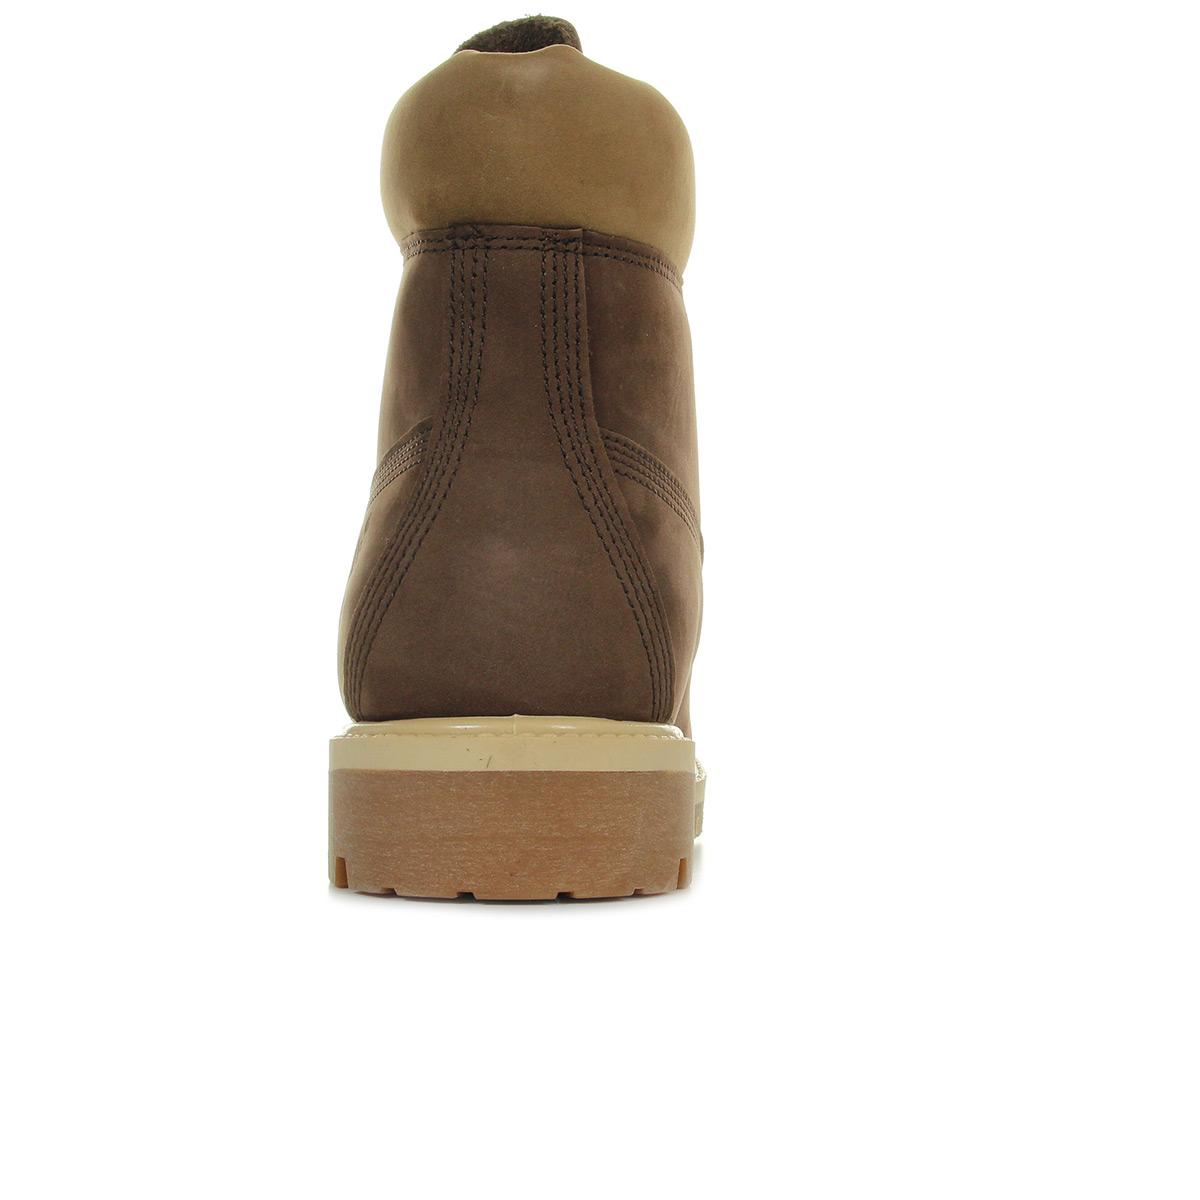 Timberland 6IN Premium Bt Dark brown CA1LY6, Boots homme